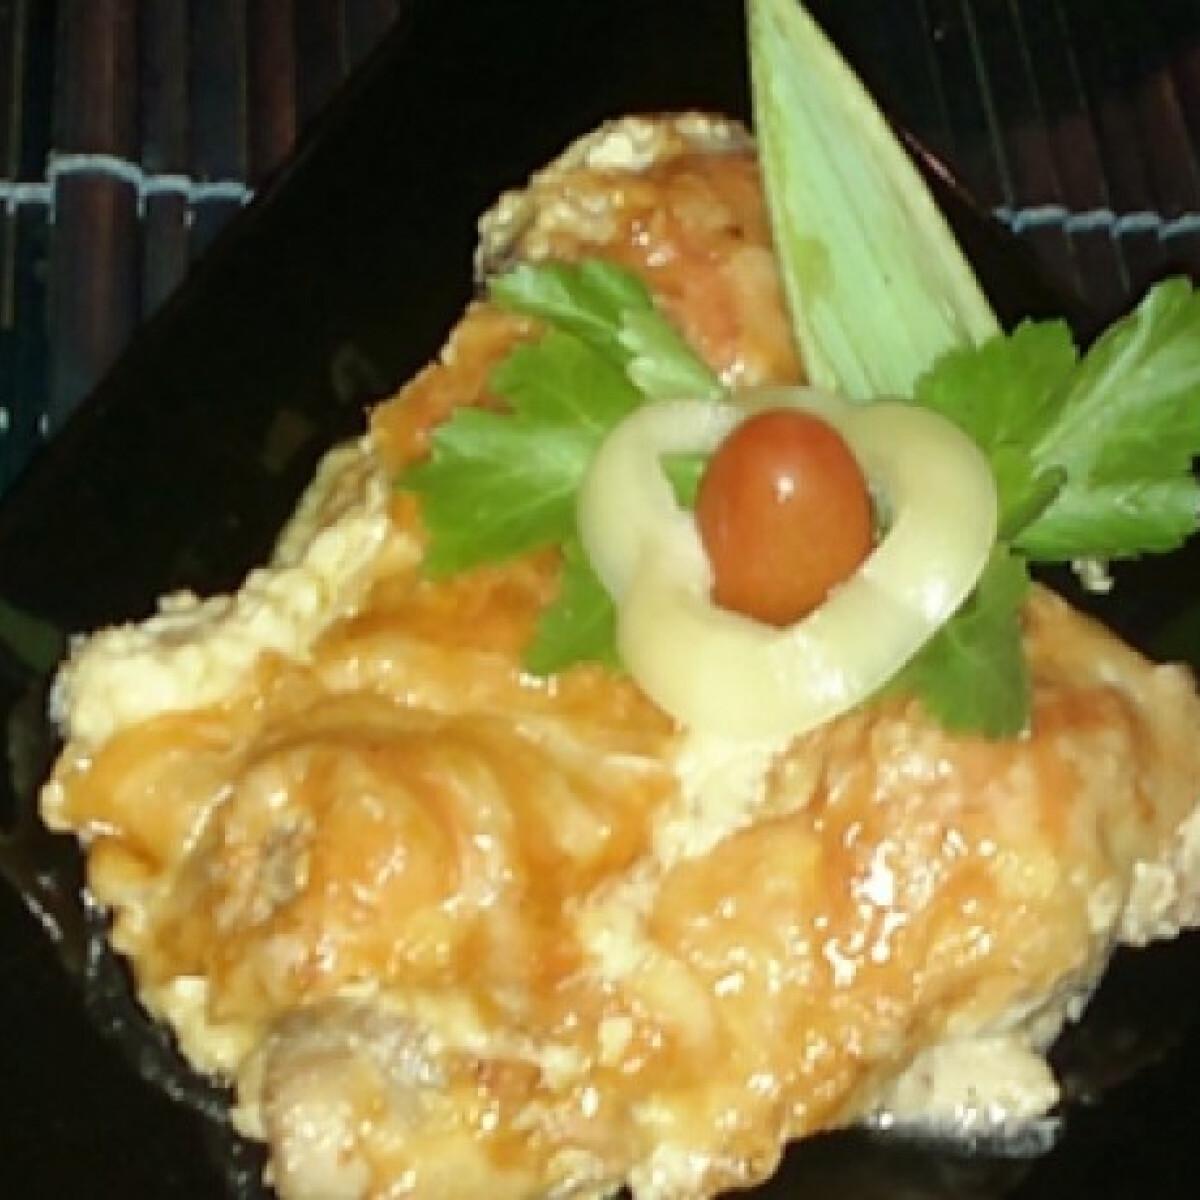 Sajtos-mustáros tejfölös csirkecomb